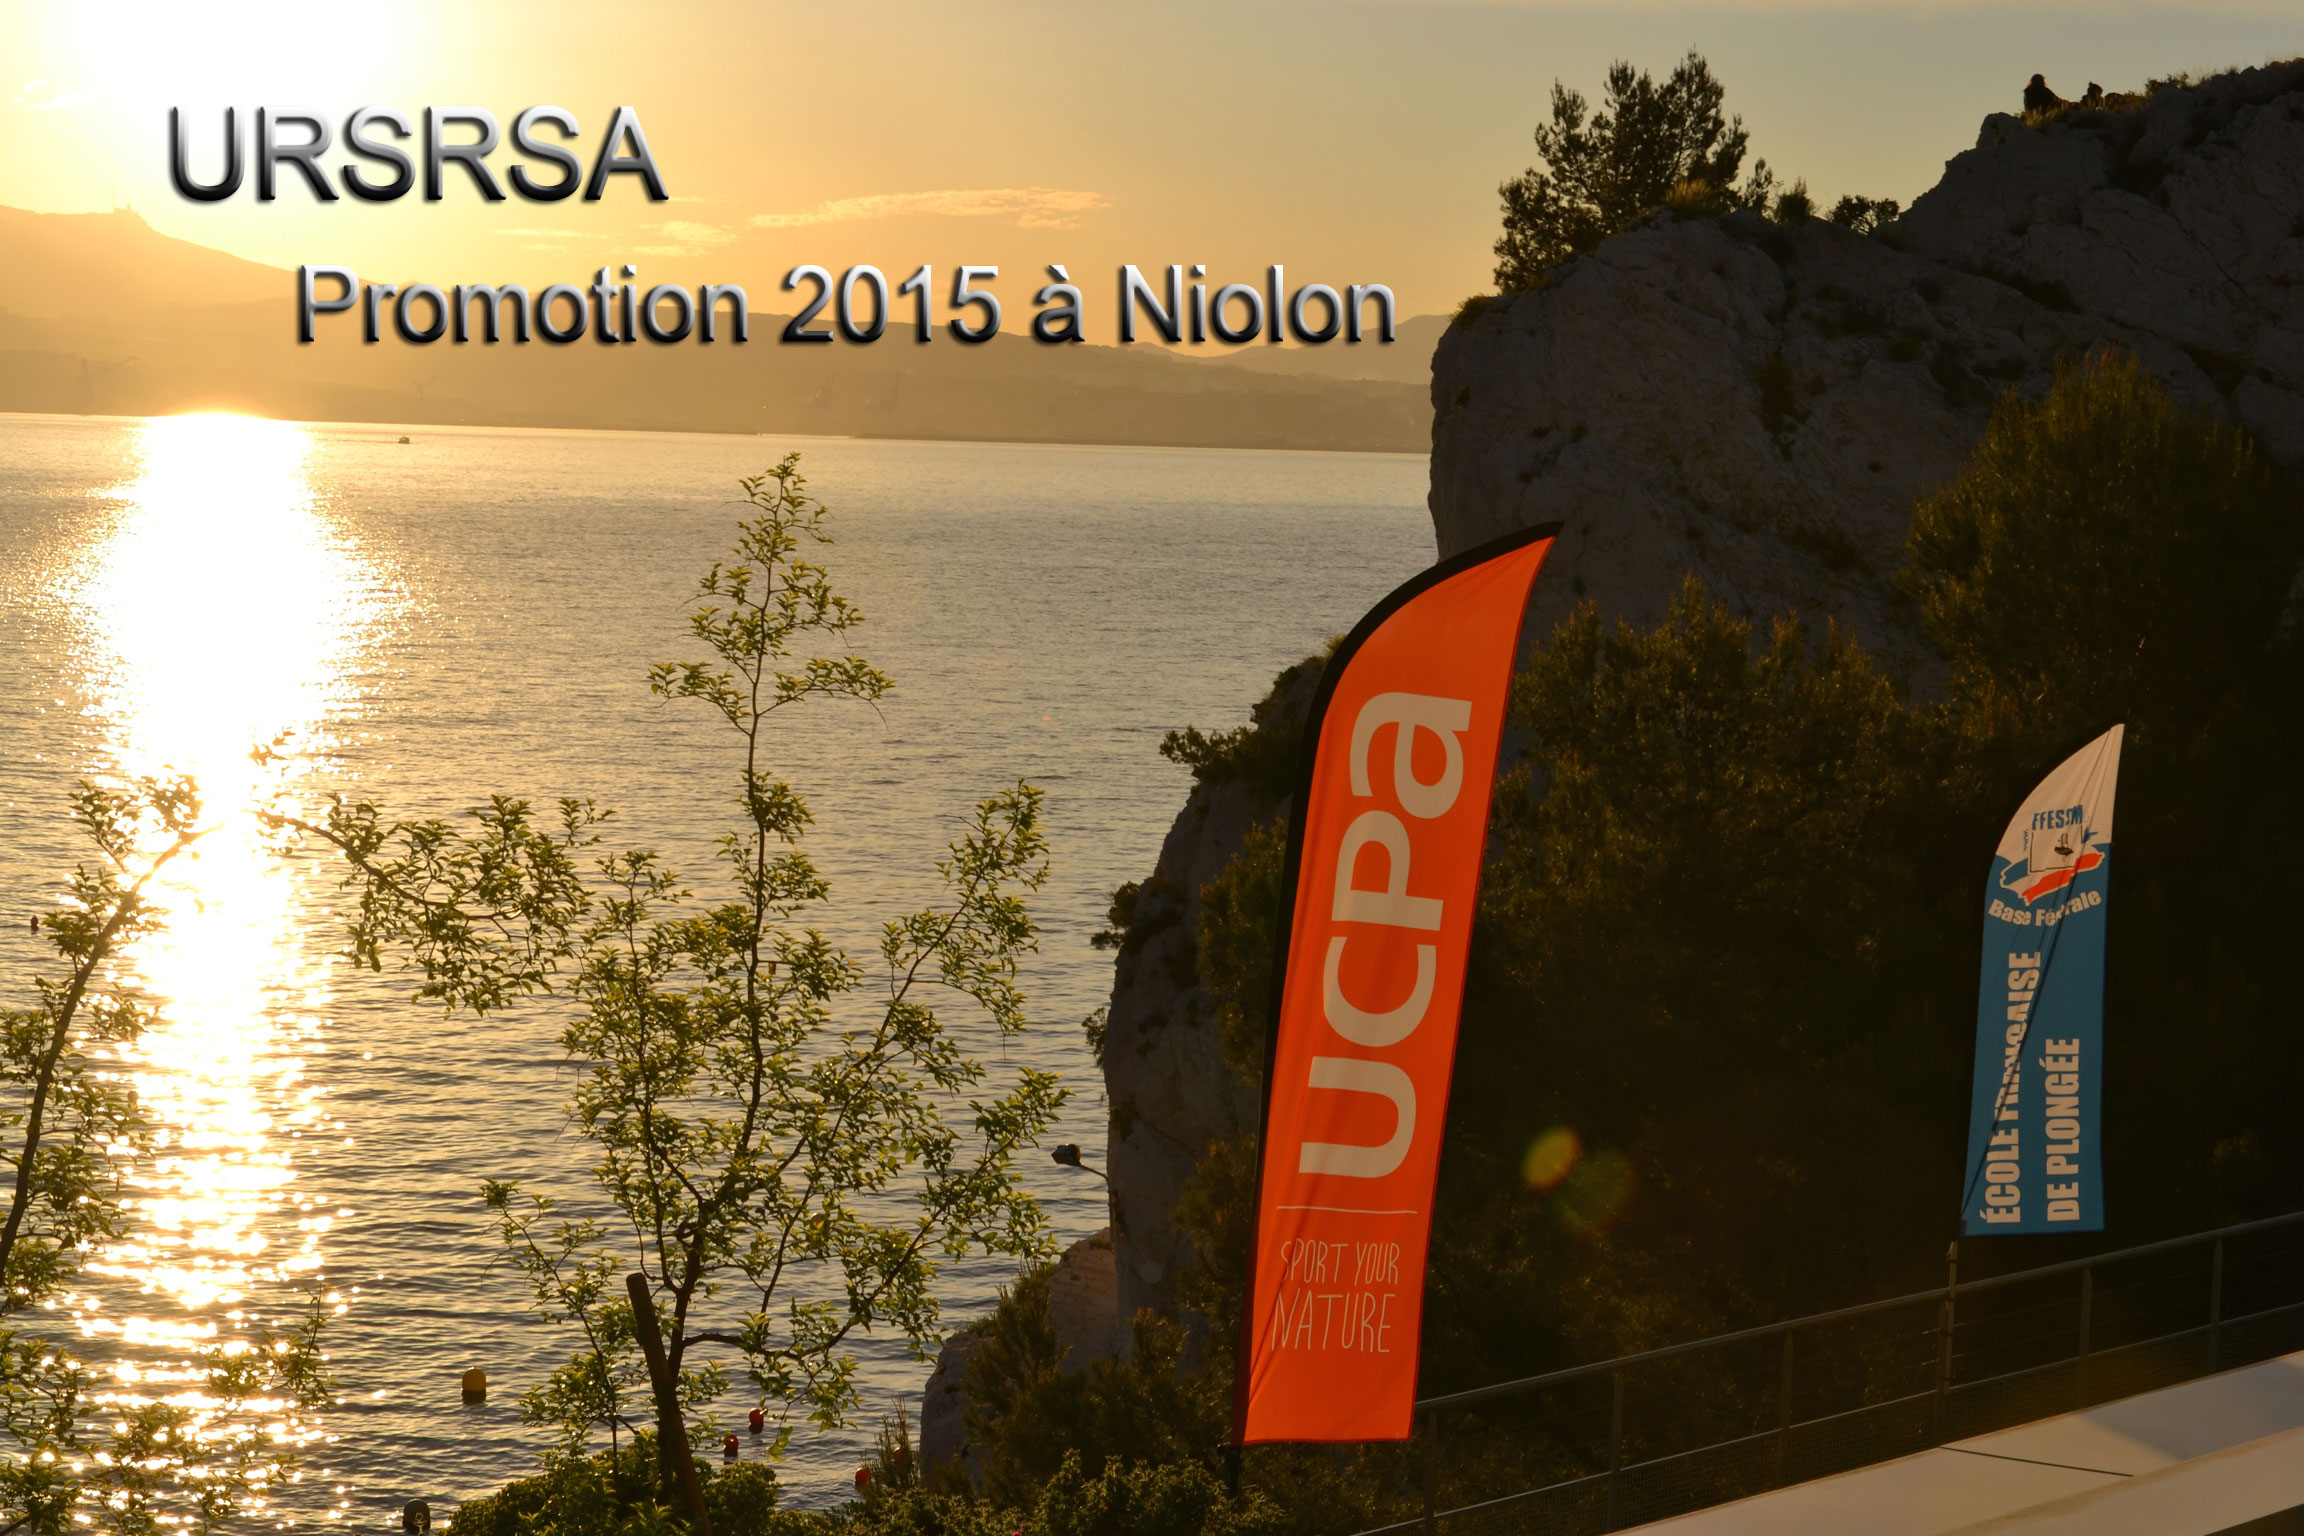 Ursrsa-Niolon-2015-001.jpg